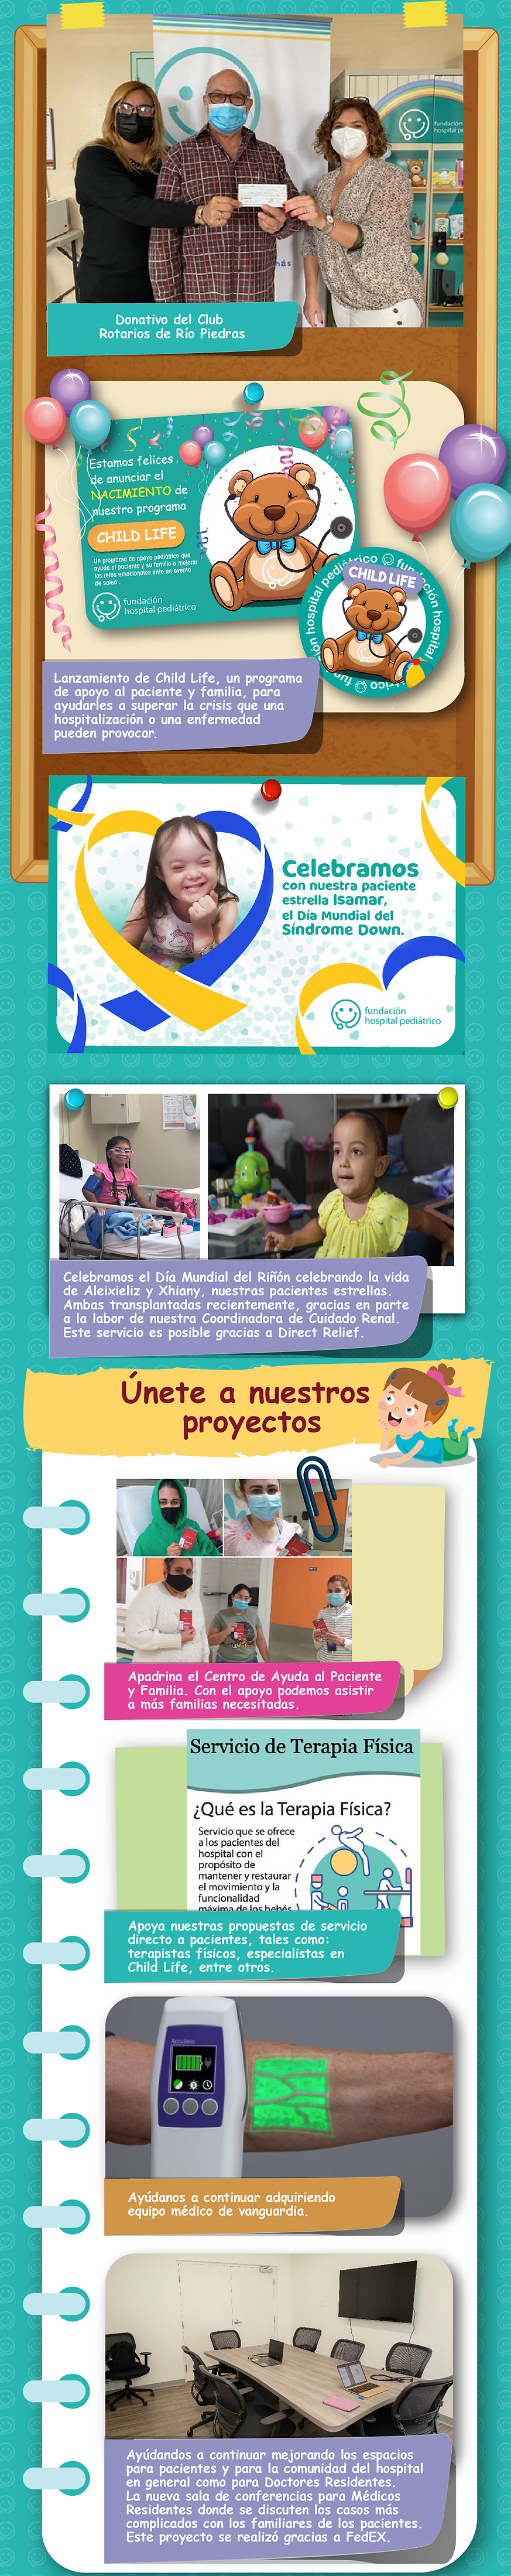 Fundación 21-03-25 News Letter-03.jpg